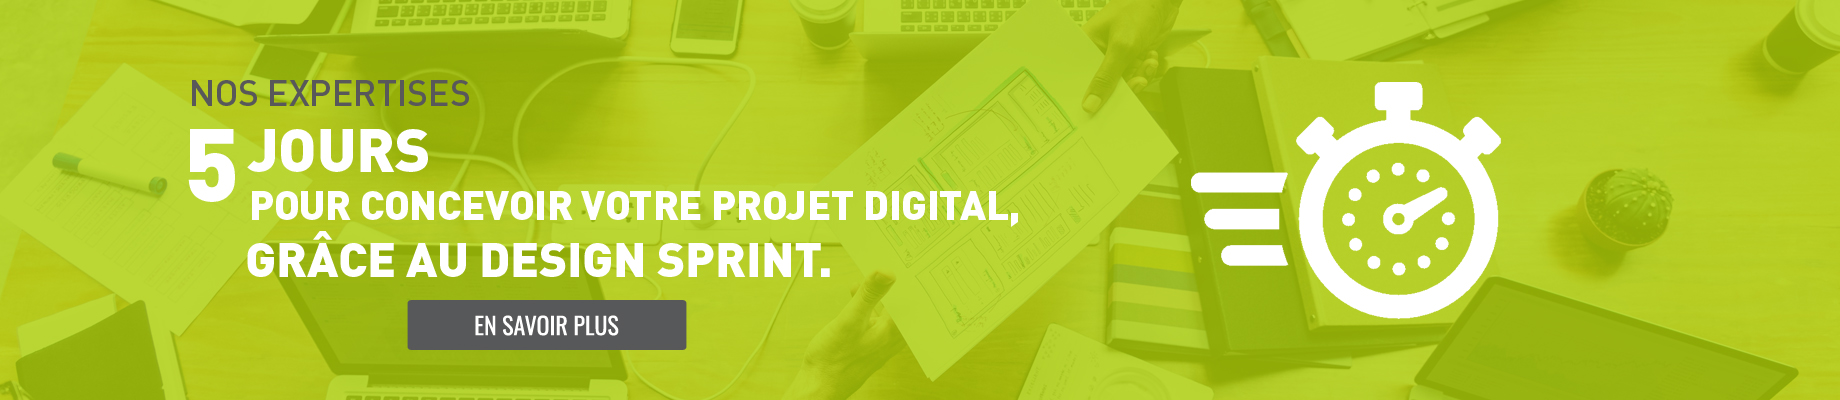 Bannière_DesignSprint